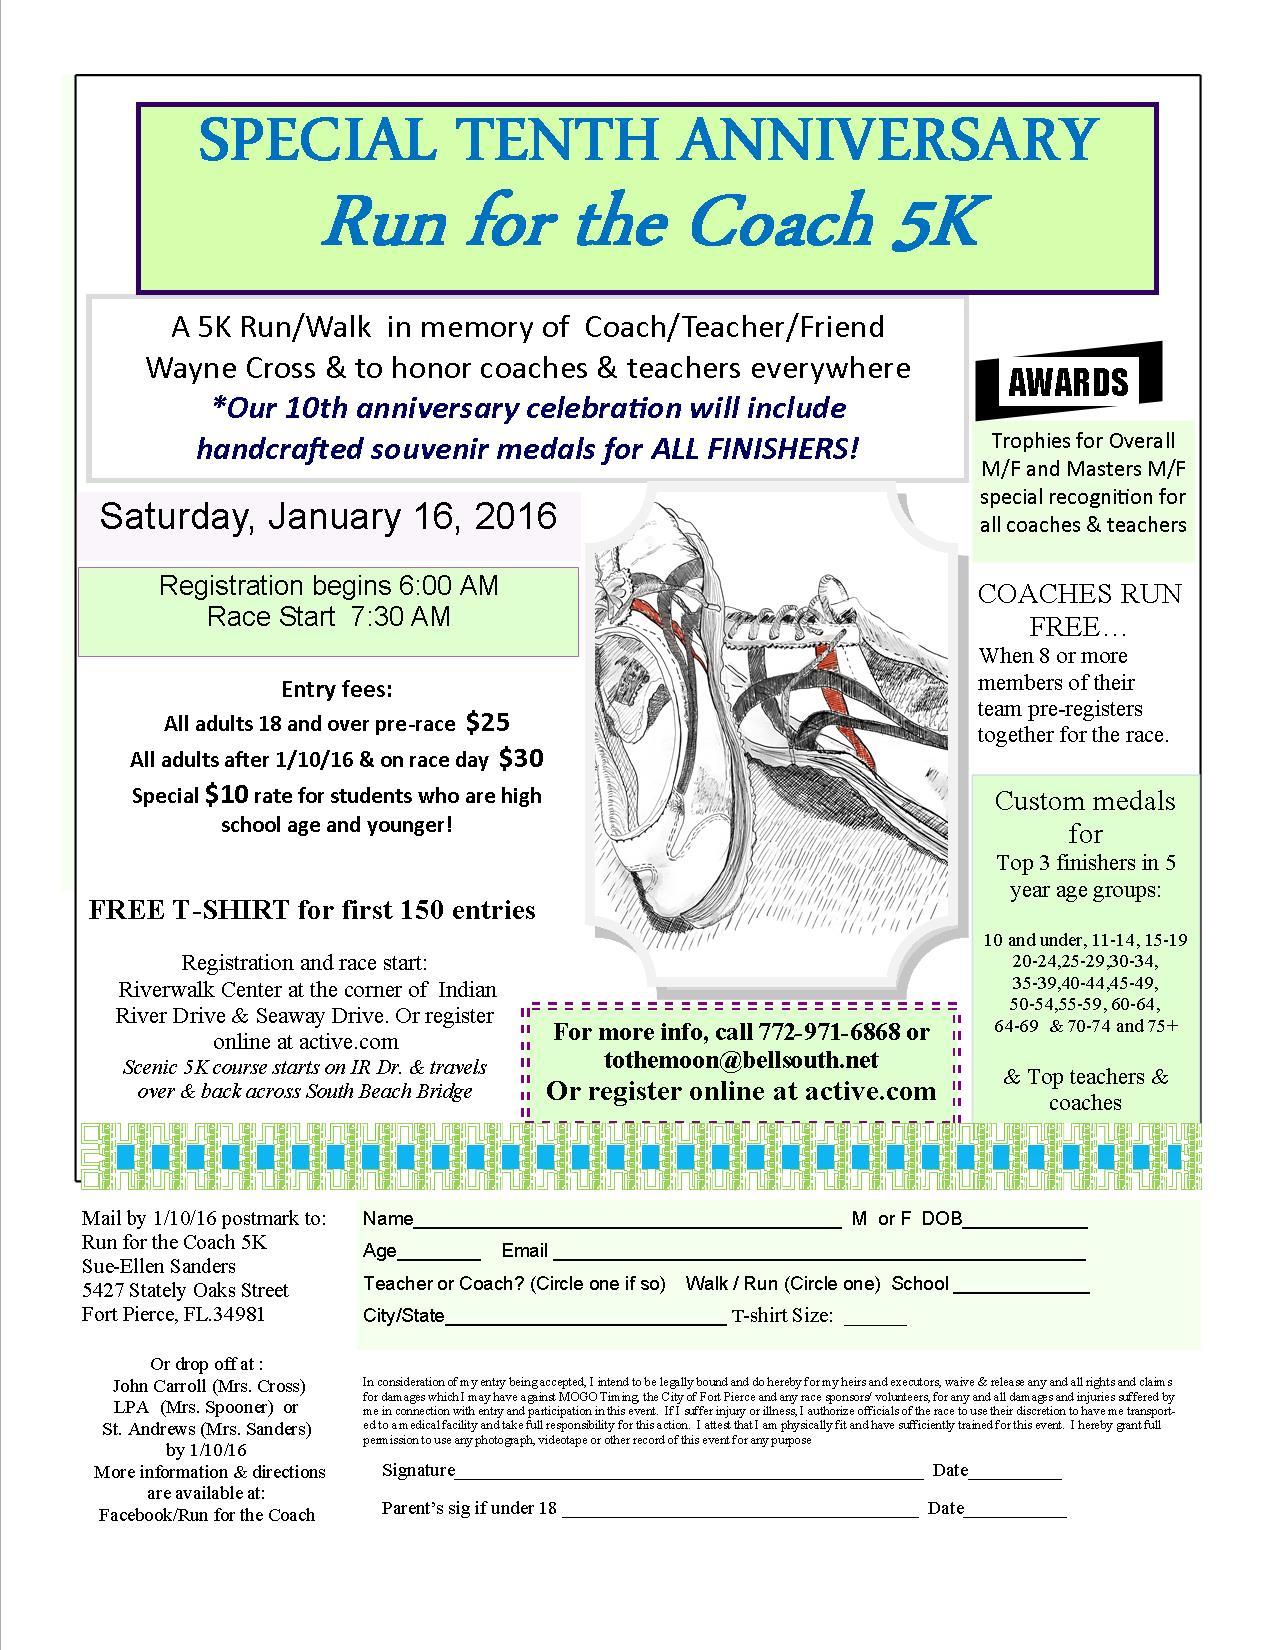 Run for the Coach 5K - 10th Anniversary - Fort Pierce, FL